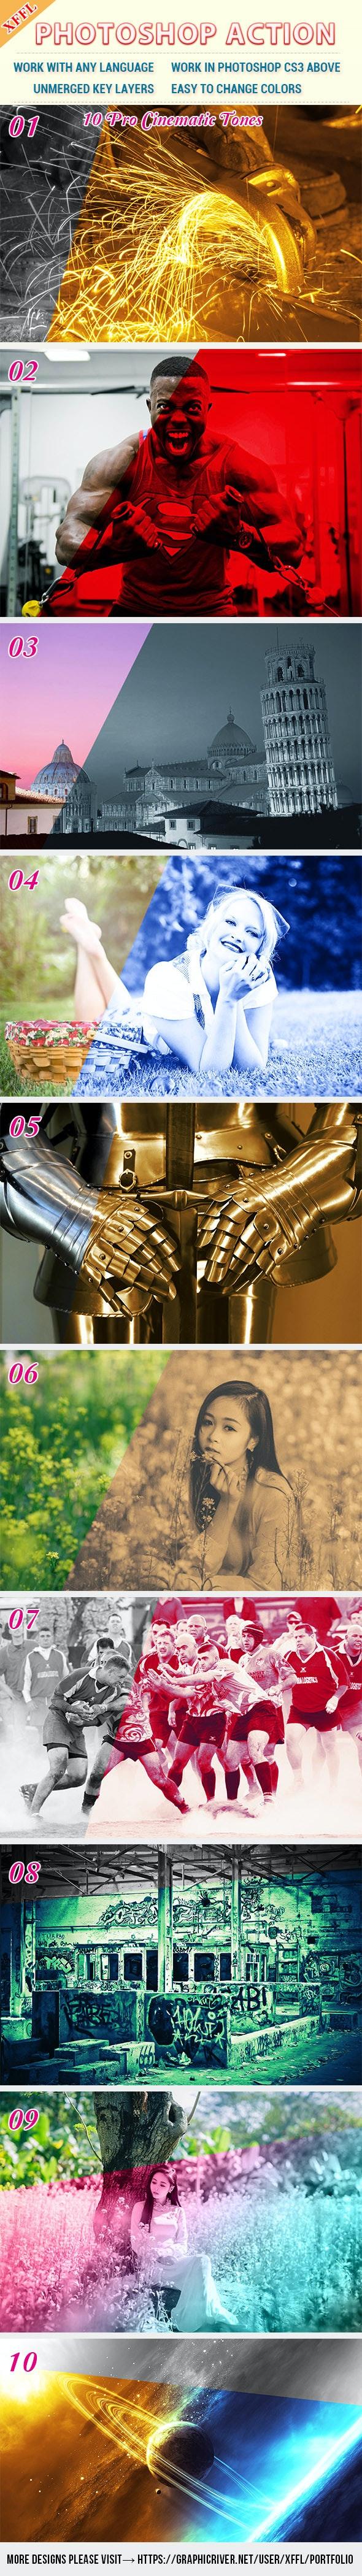 10 Pro Cinematic Tones Photoshop Action - Photo Effects Actions